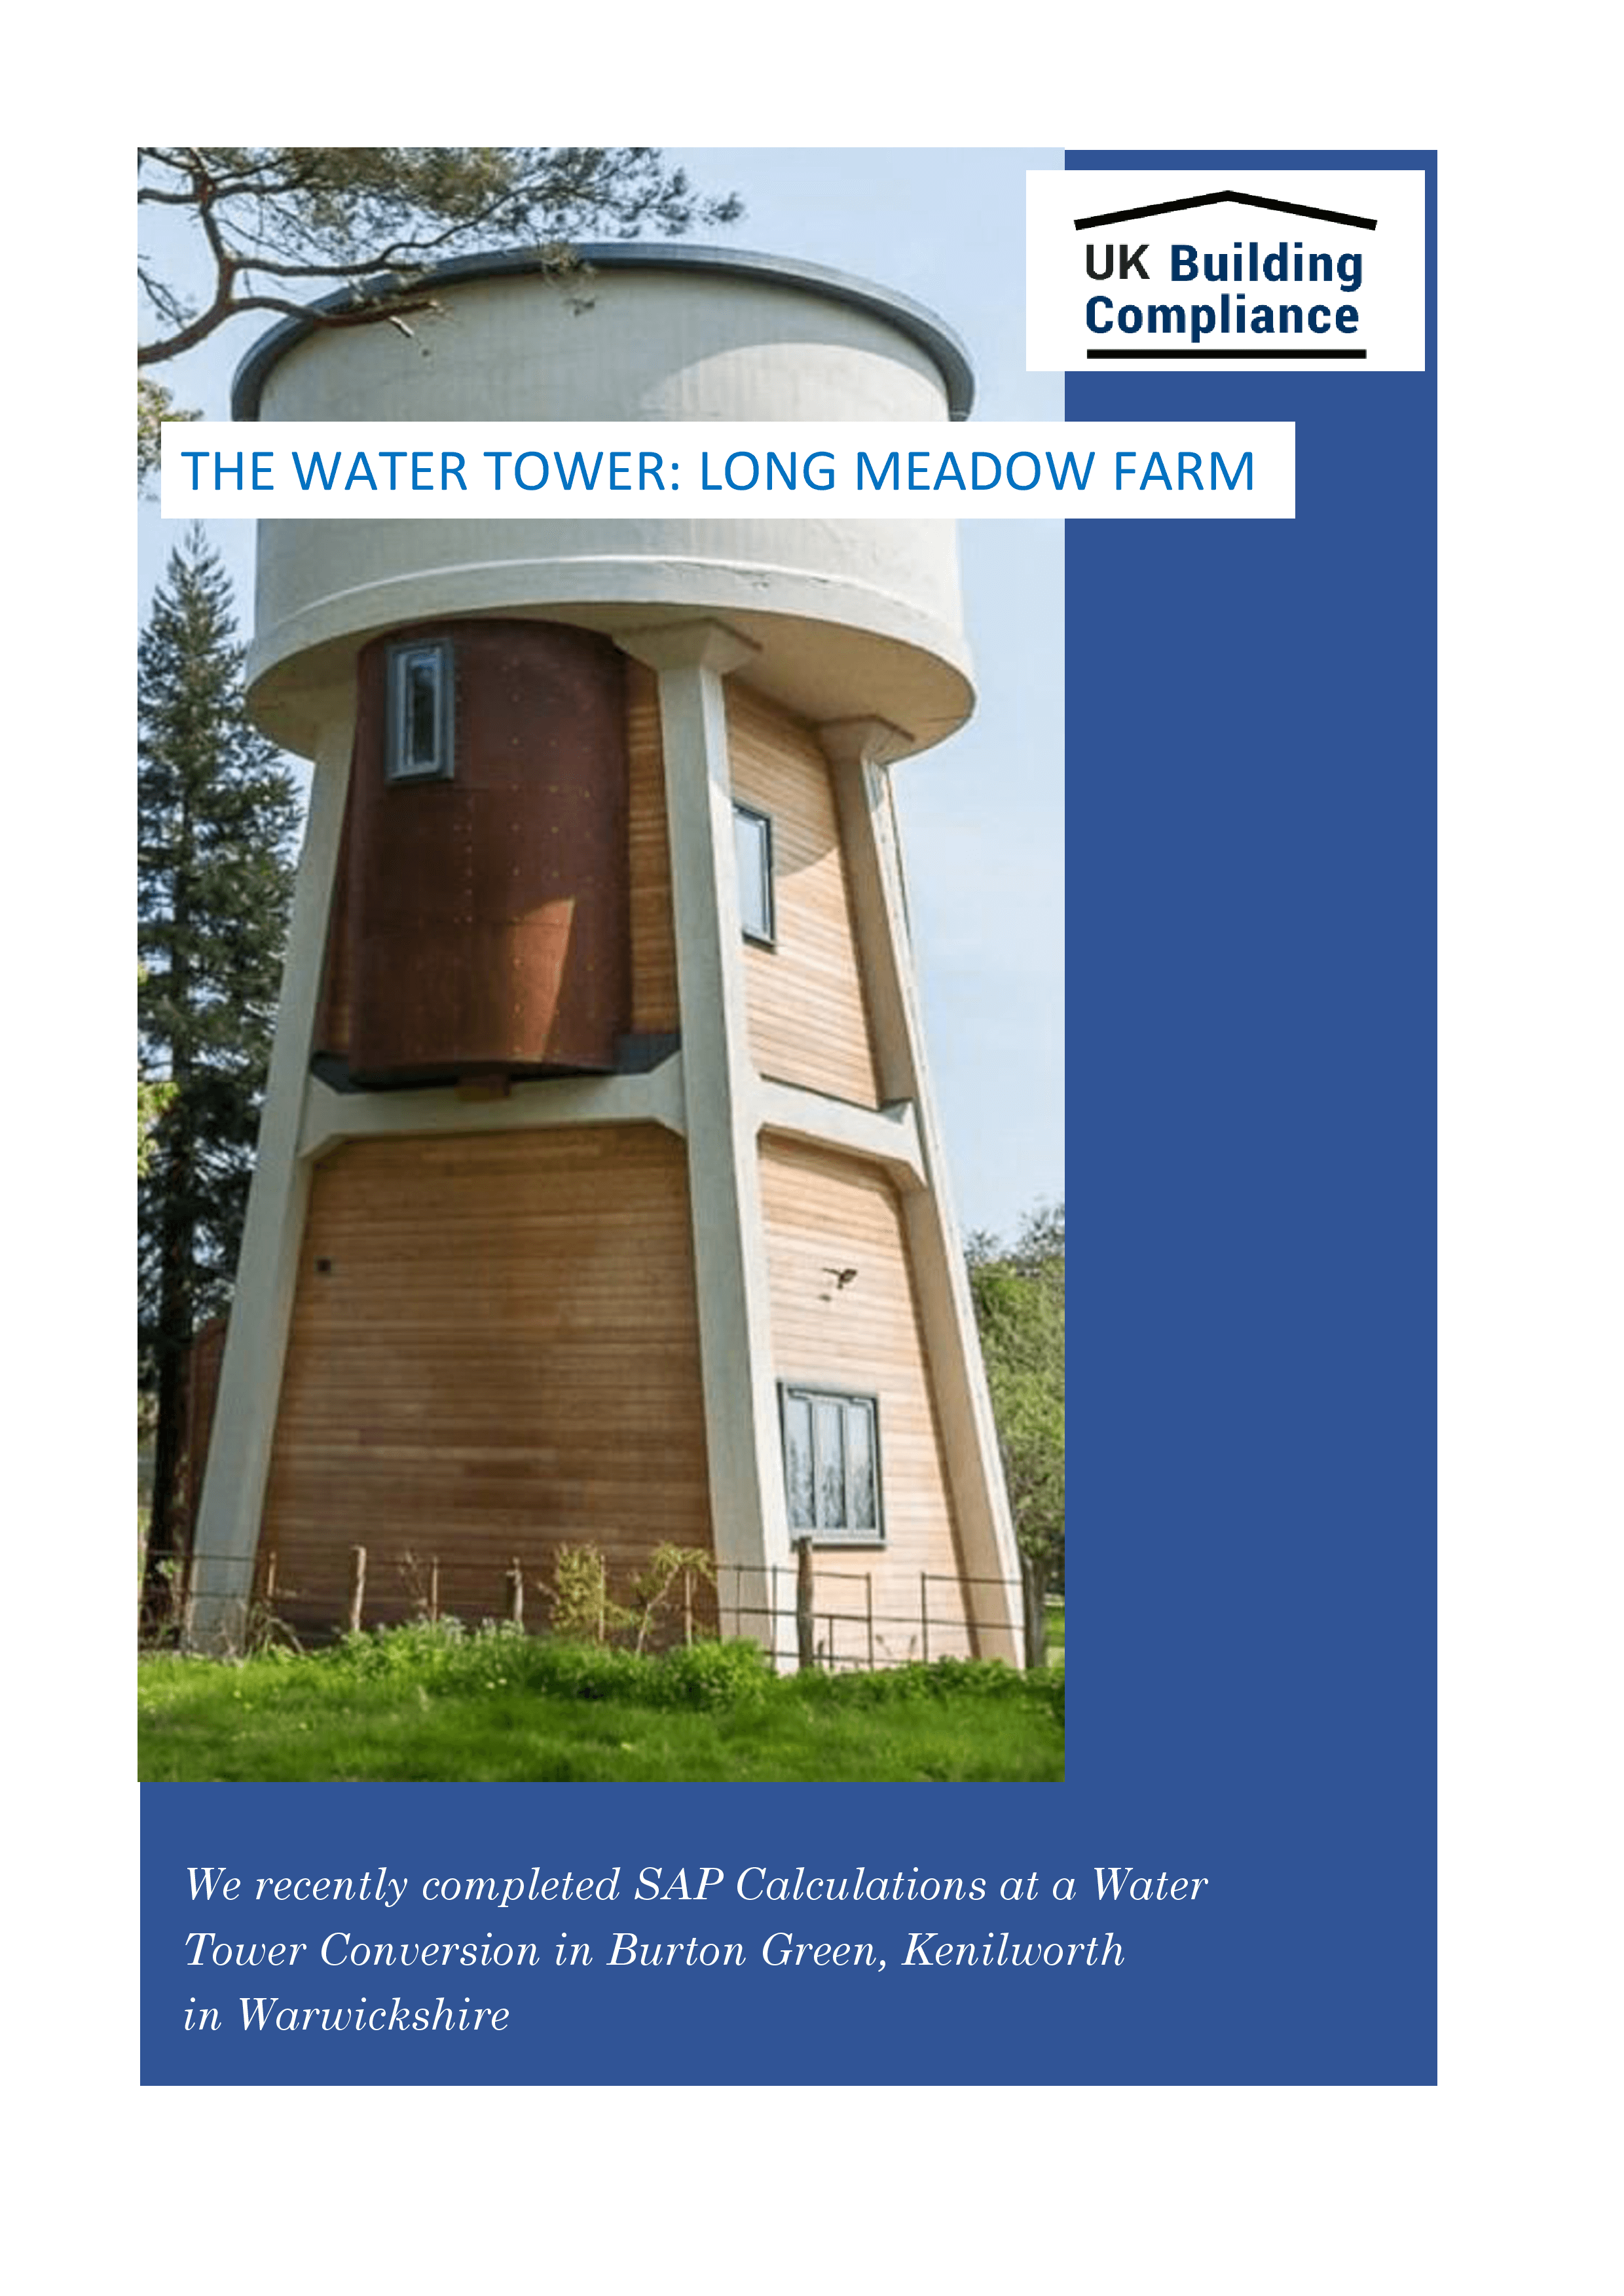 The Water Tower, Long Meadow Farm, Kenilworth, Warwickshire